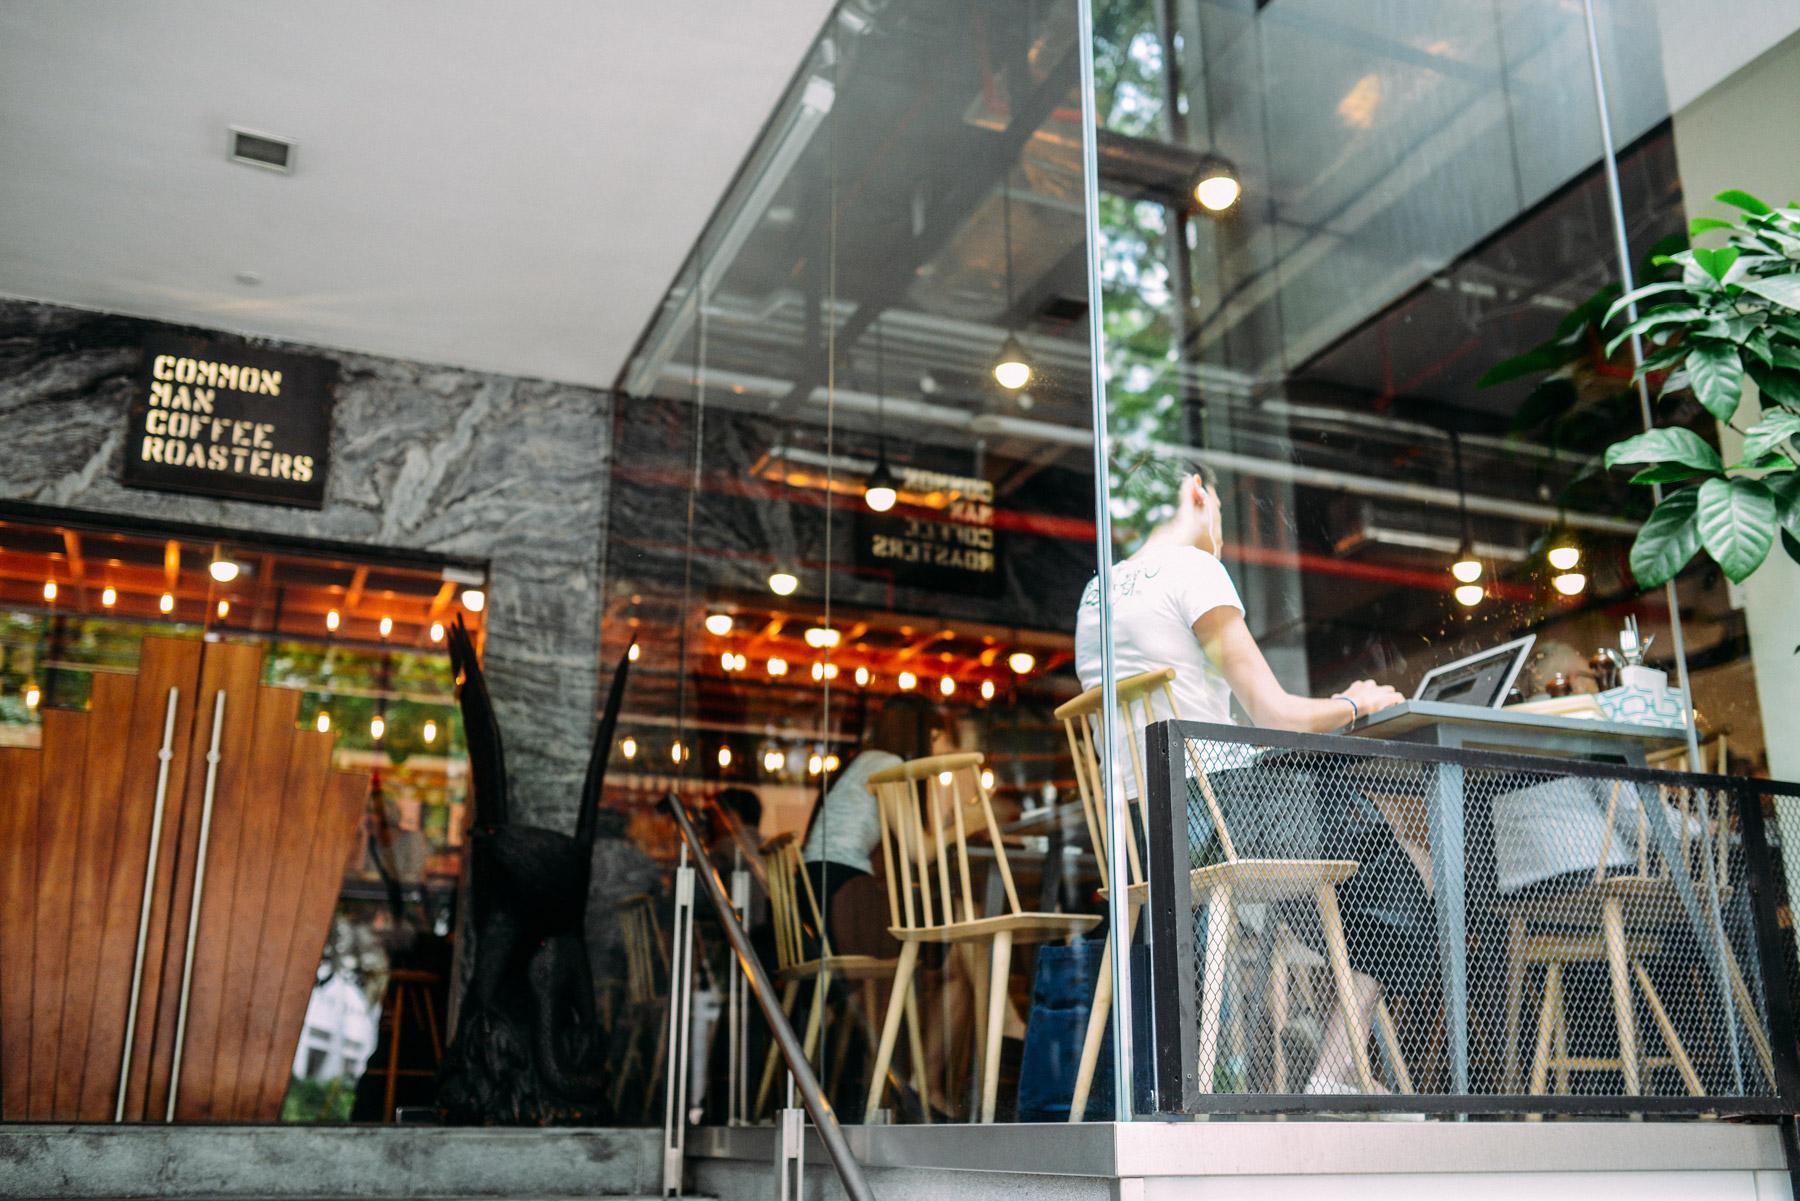 glass-window-wall-glazing-coffee-roasters-montreal-vitrerie-jl